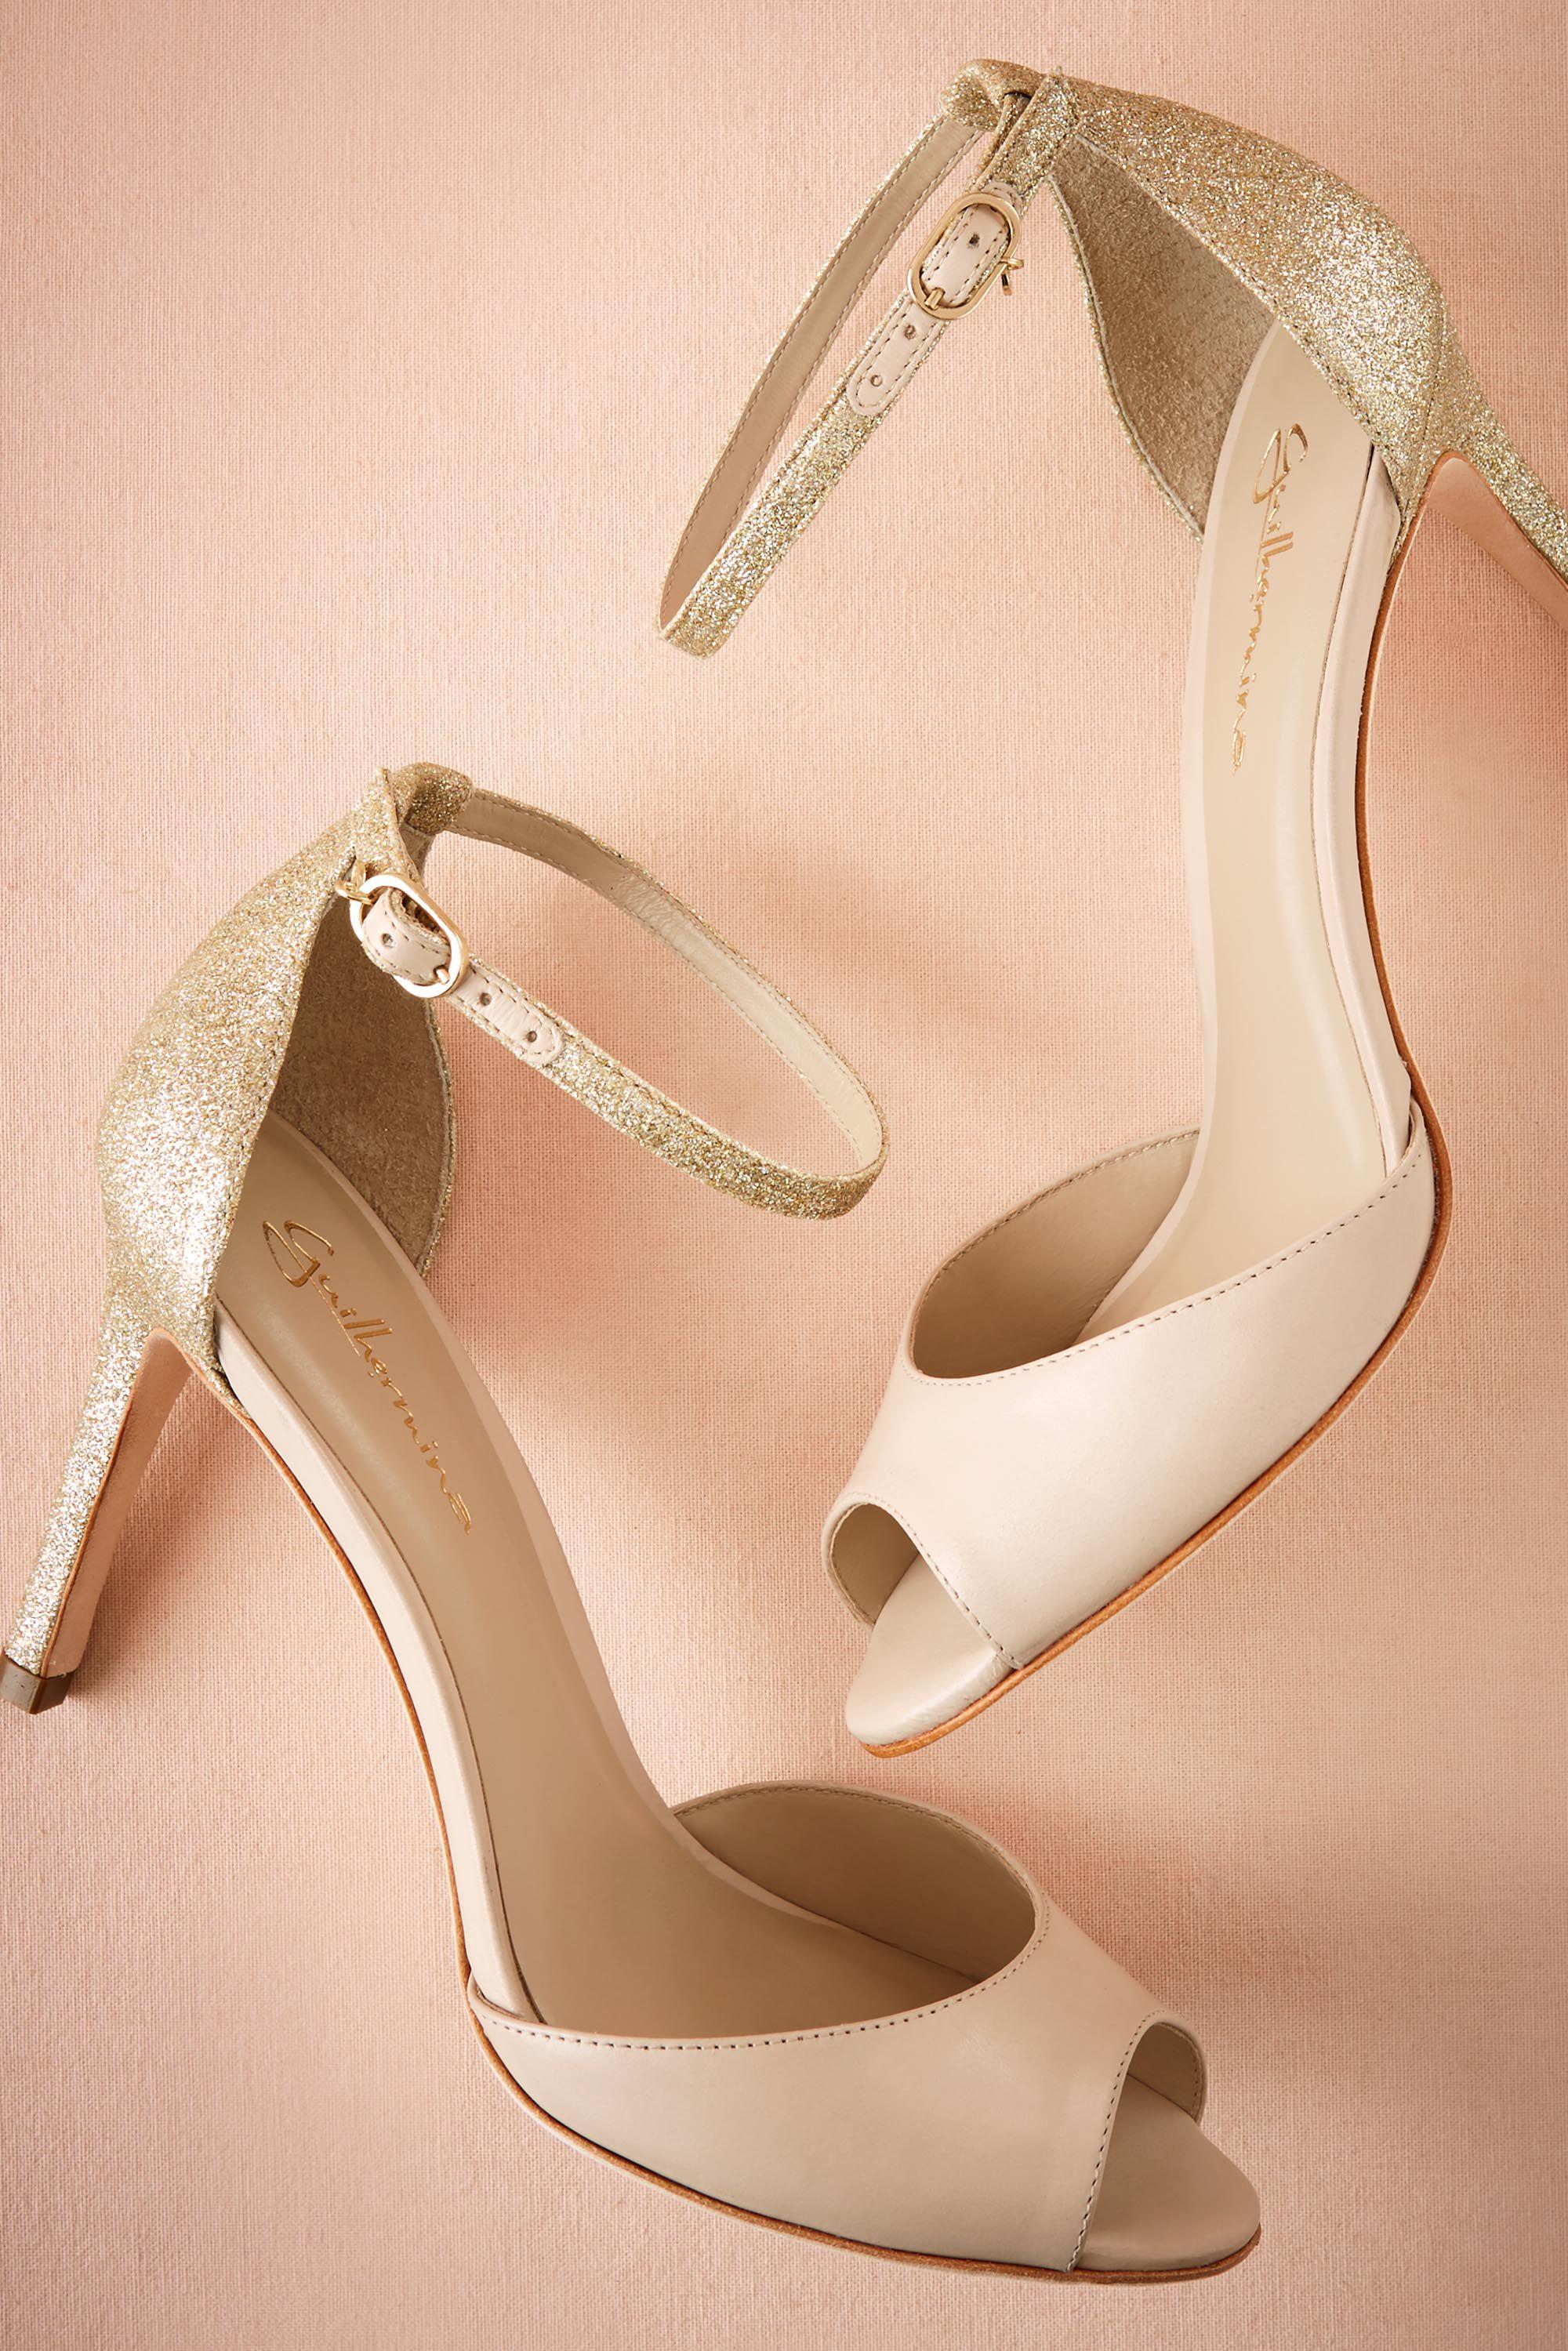 Chandon Heels